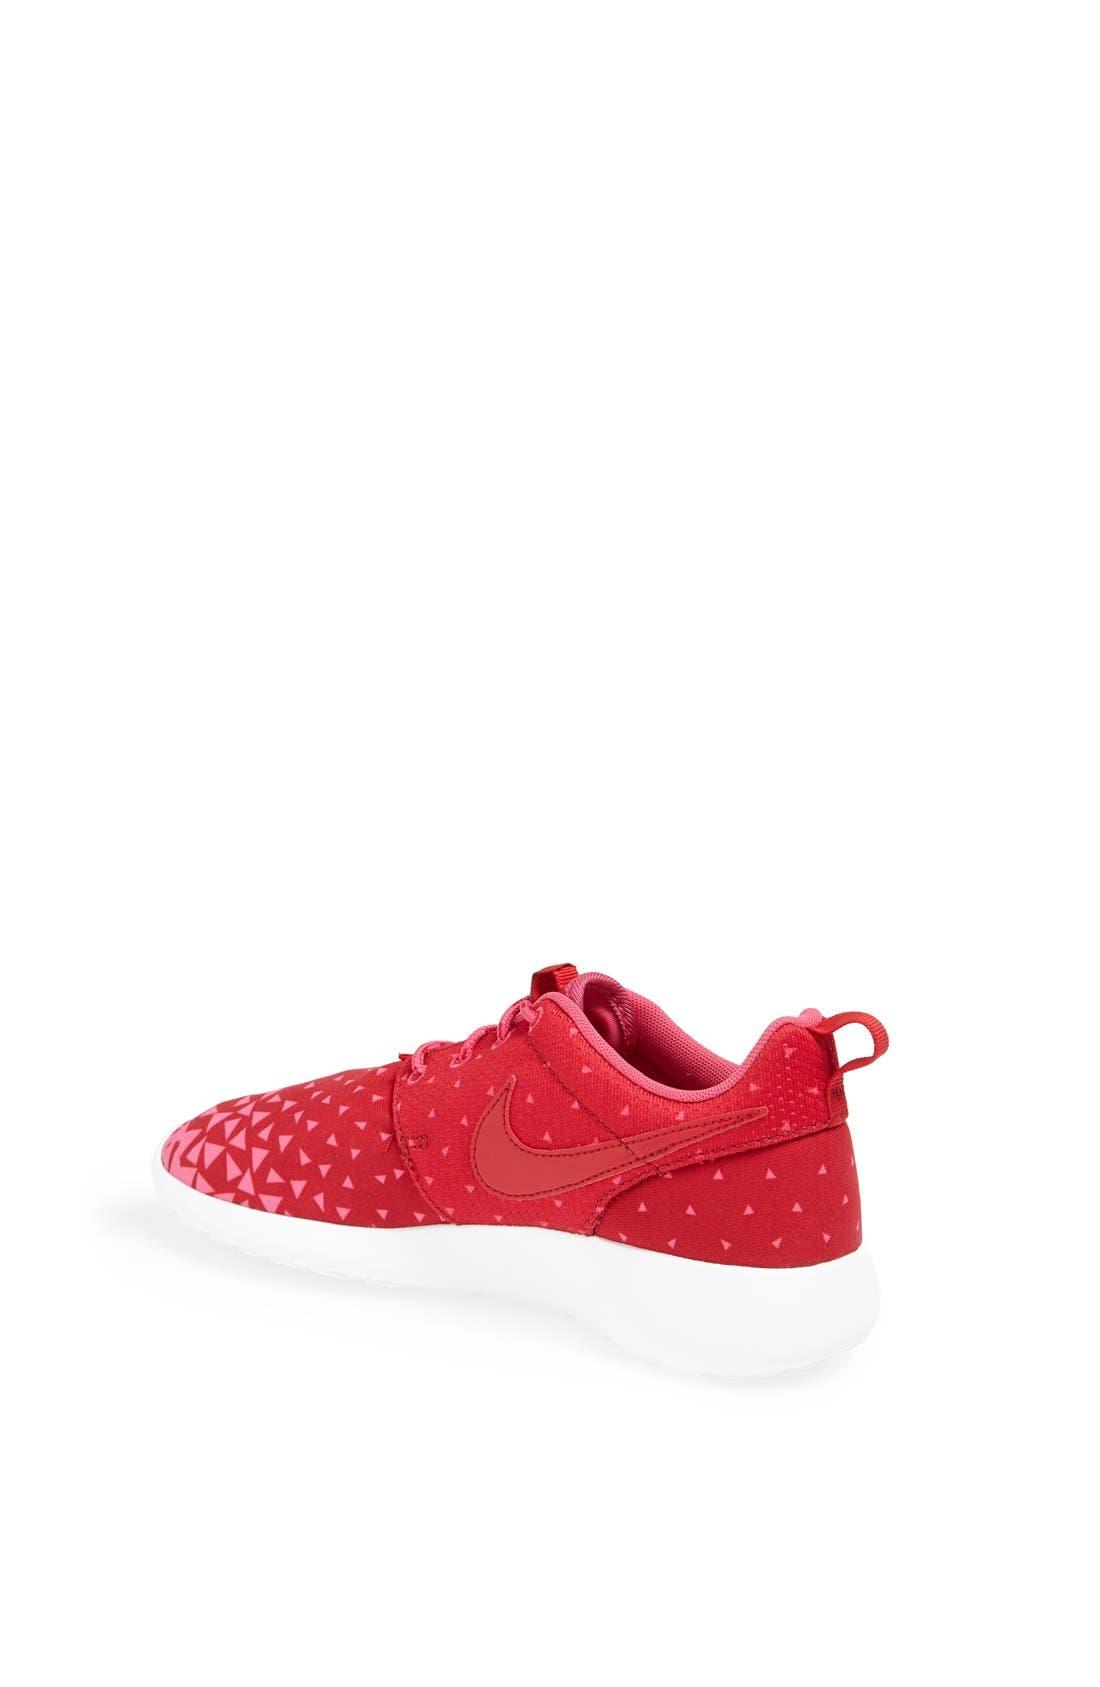 'Roshe Run' Athletic Shoe,                             Alternate thumbnail 175, color,